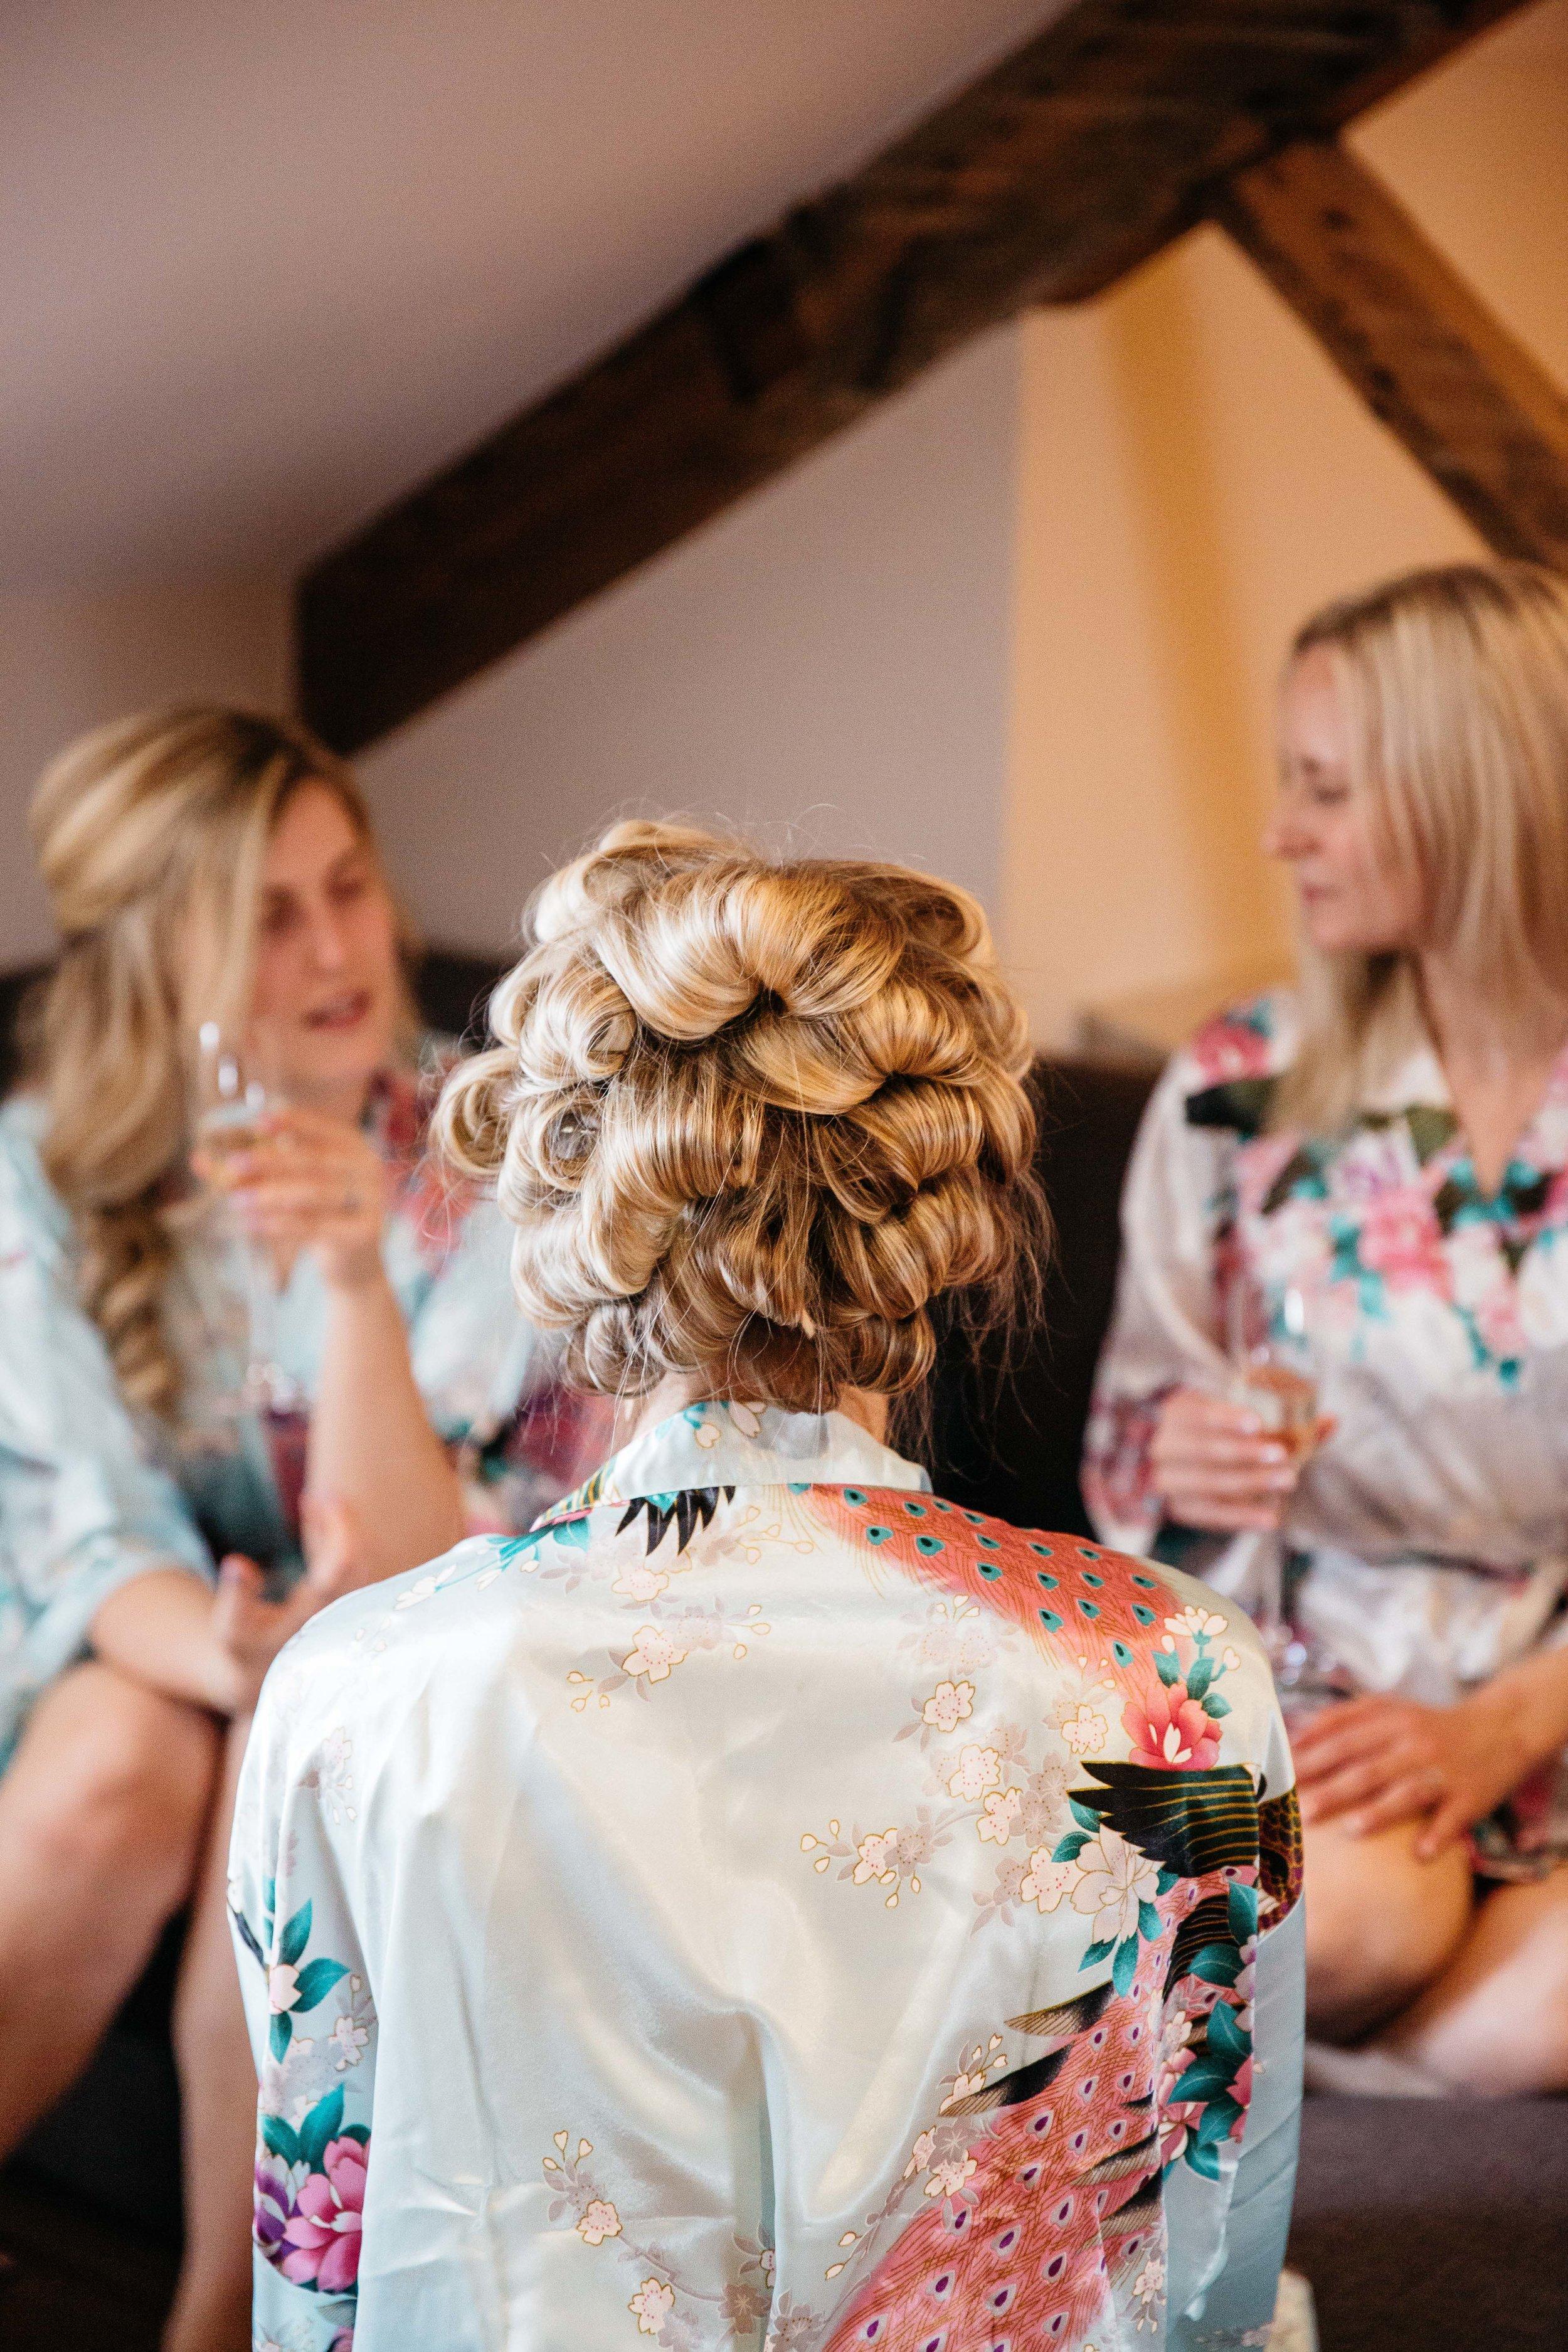 Bridesmaid Hair and makeup getting ready at Hotel Du Vin Harrogate